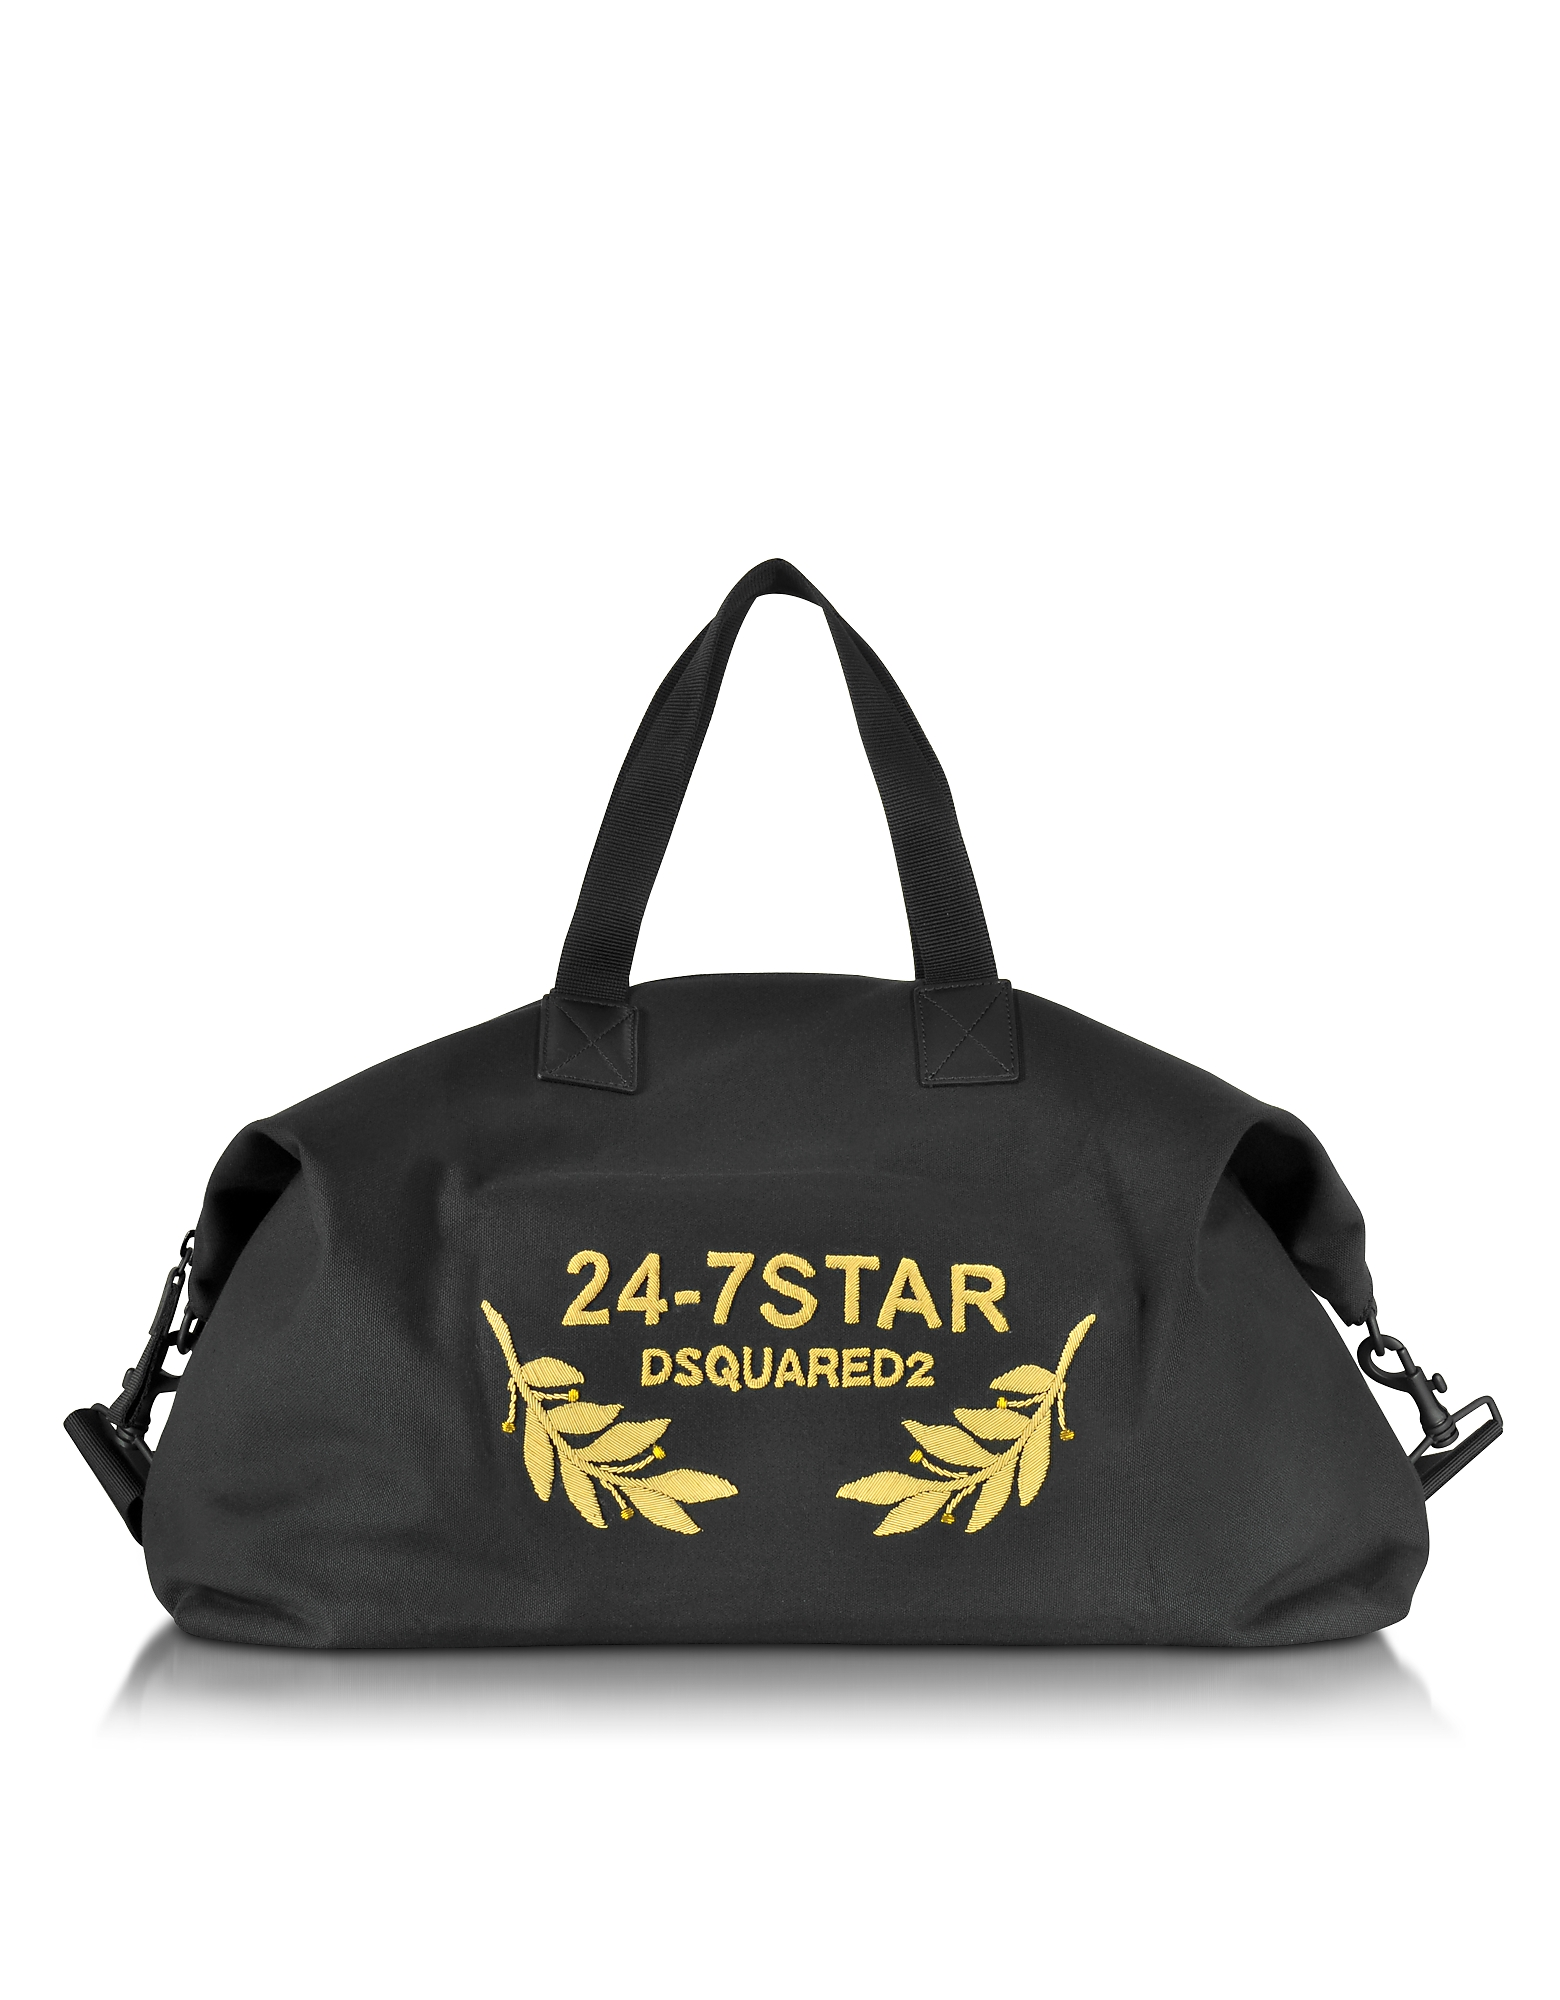 24-7 Star Icon - Черная Сумка для Одежды из Ткани